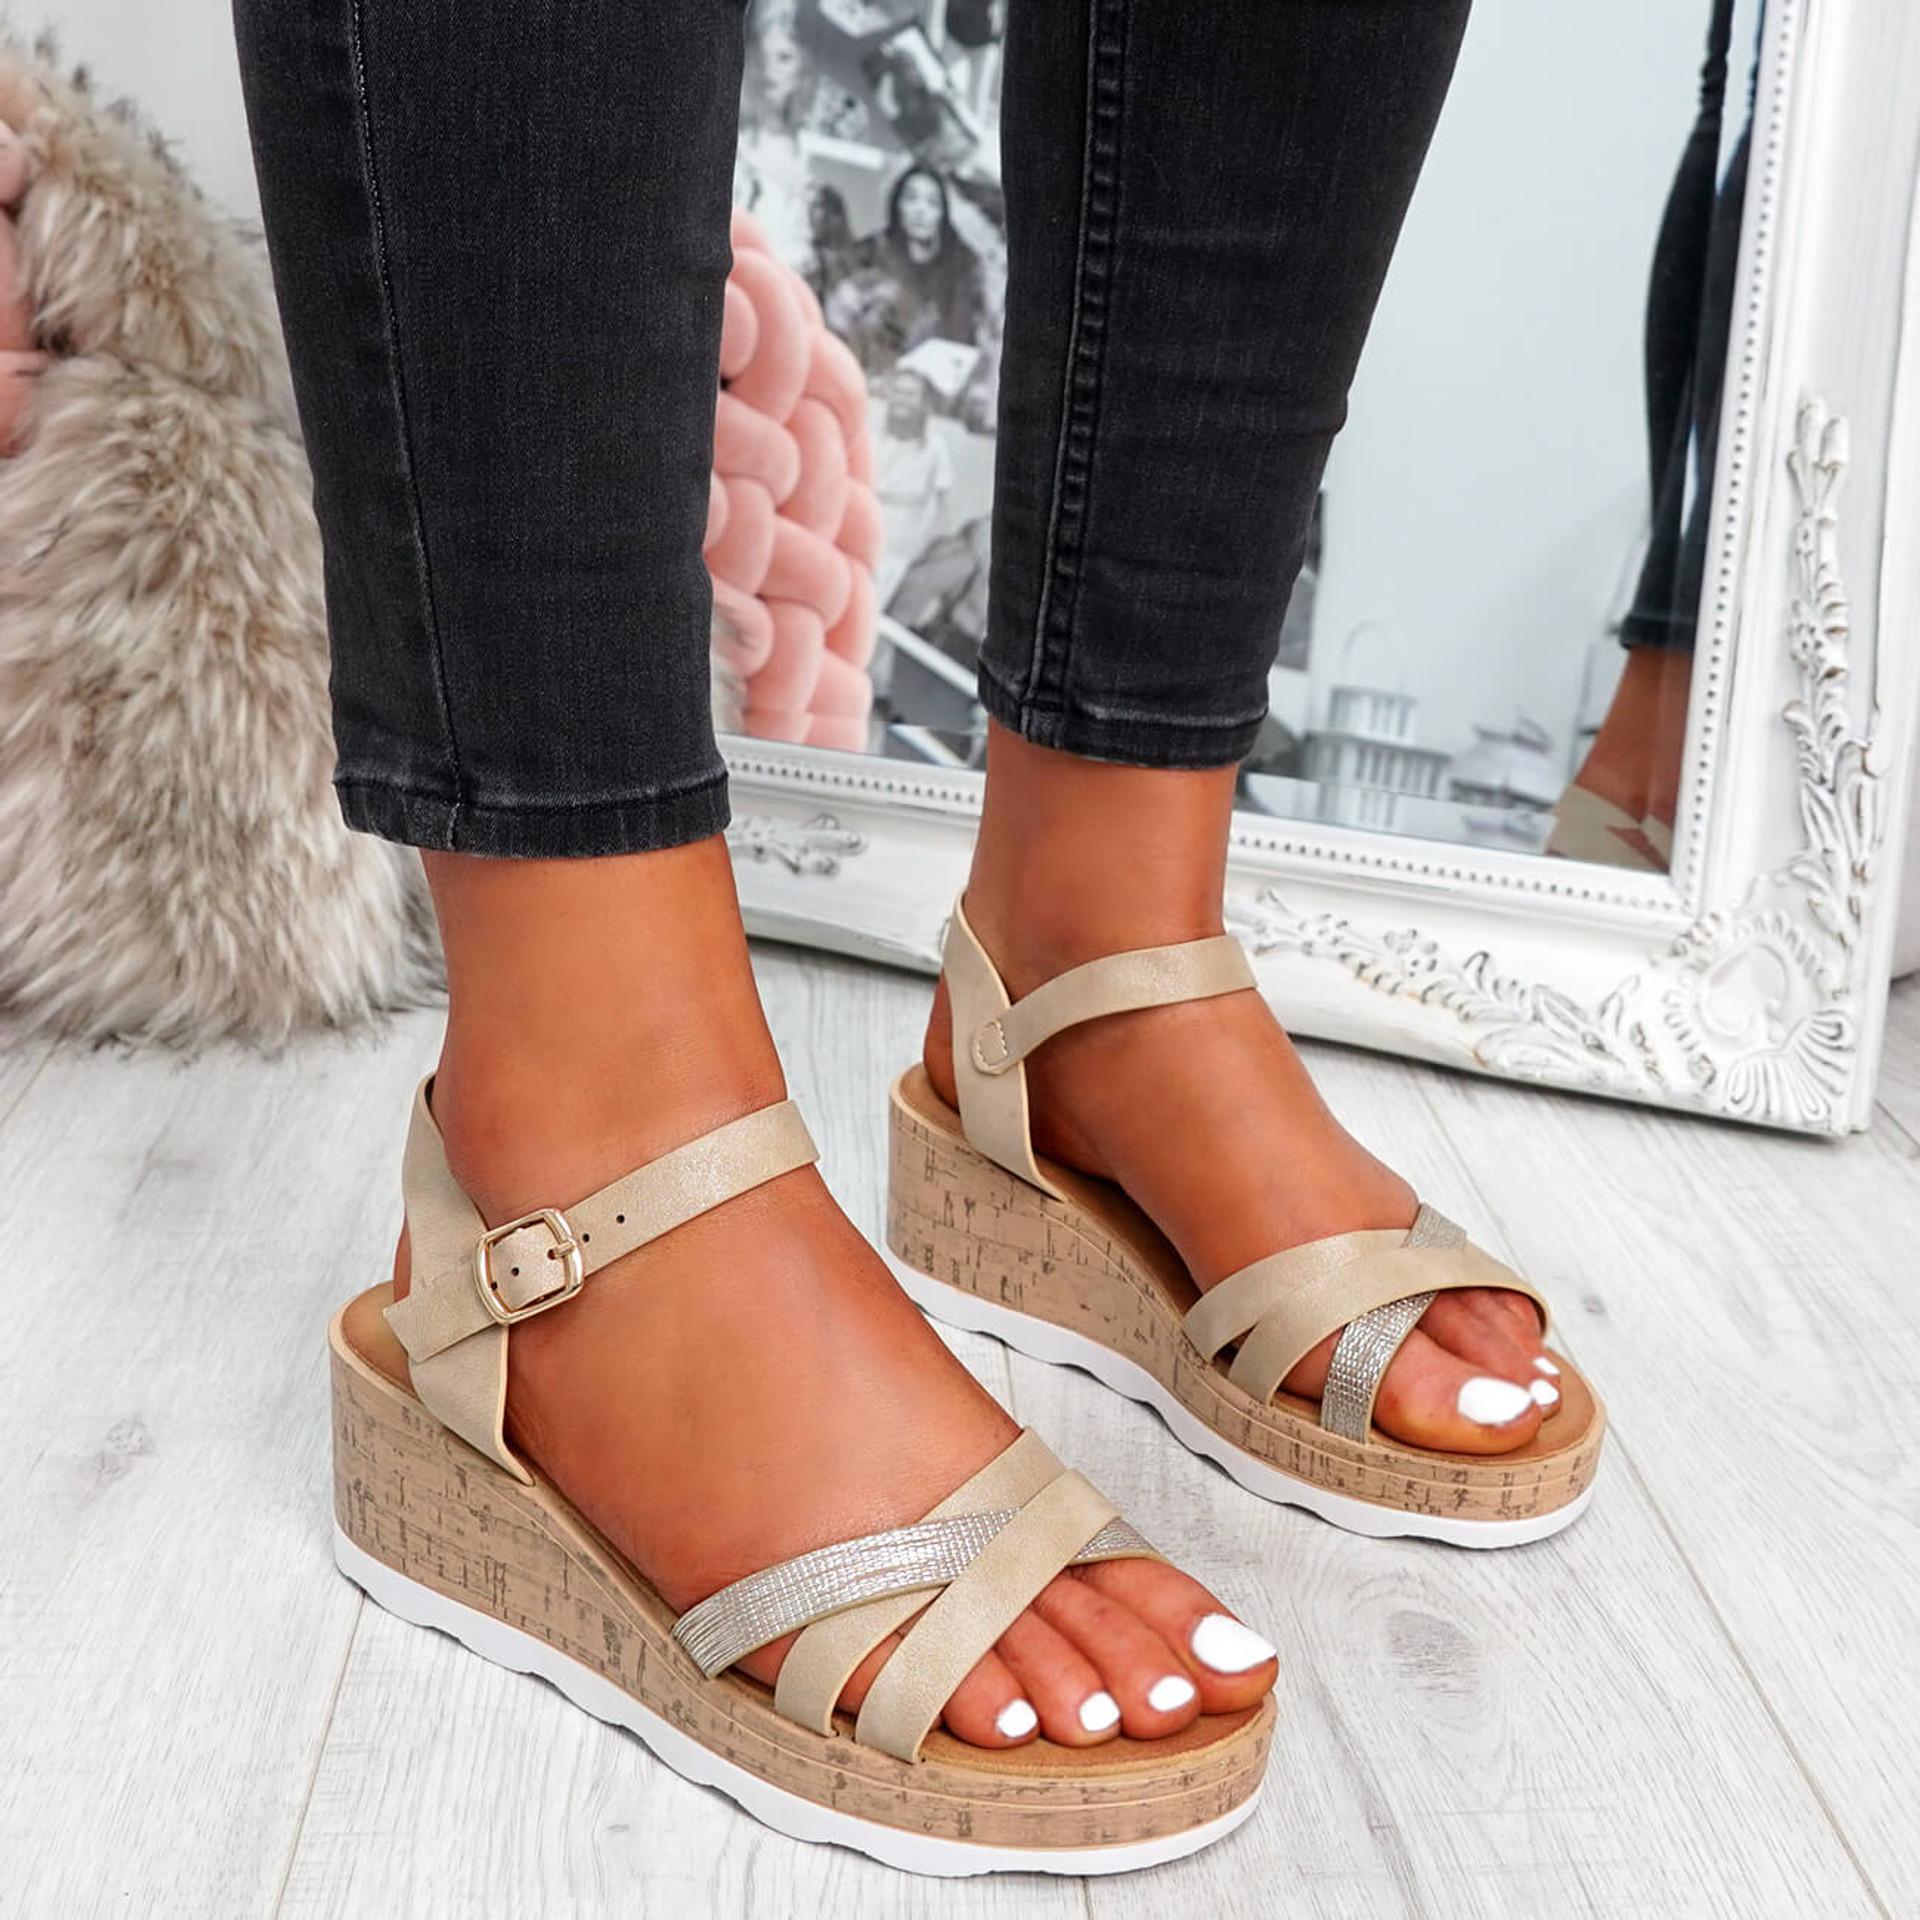 womens ladies wedge peep toe platform ankle strap sandals comfy shoes size uk 3 4 5 6 7 8